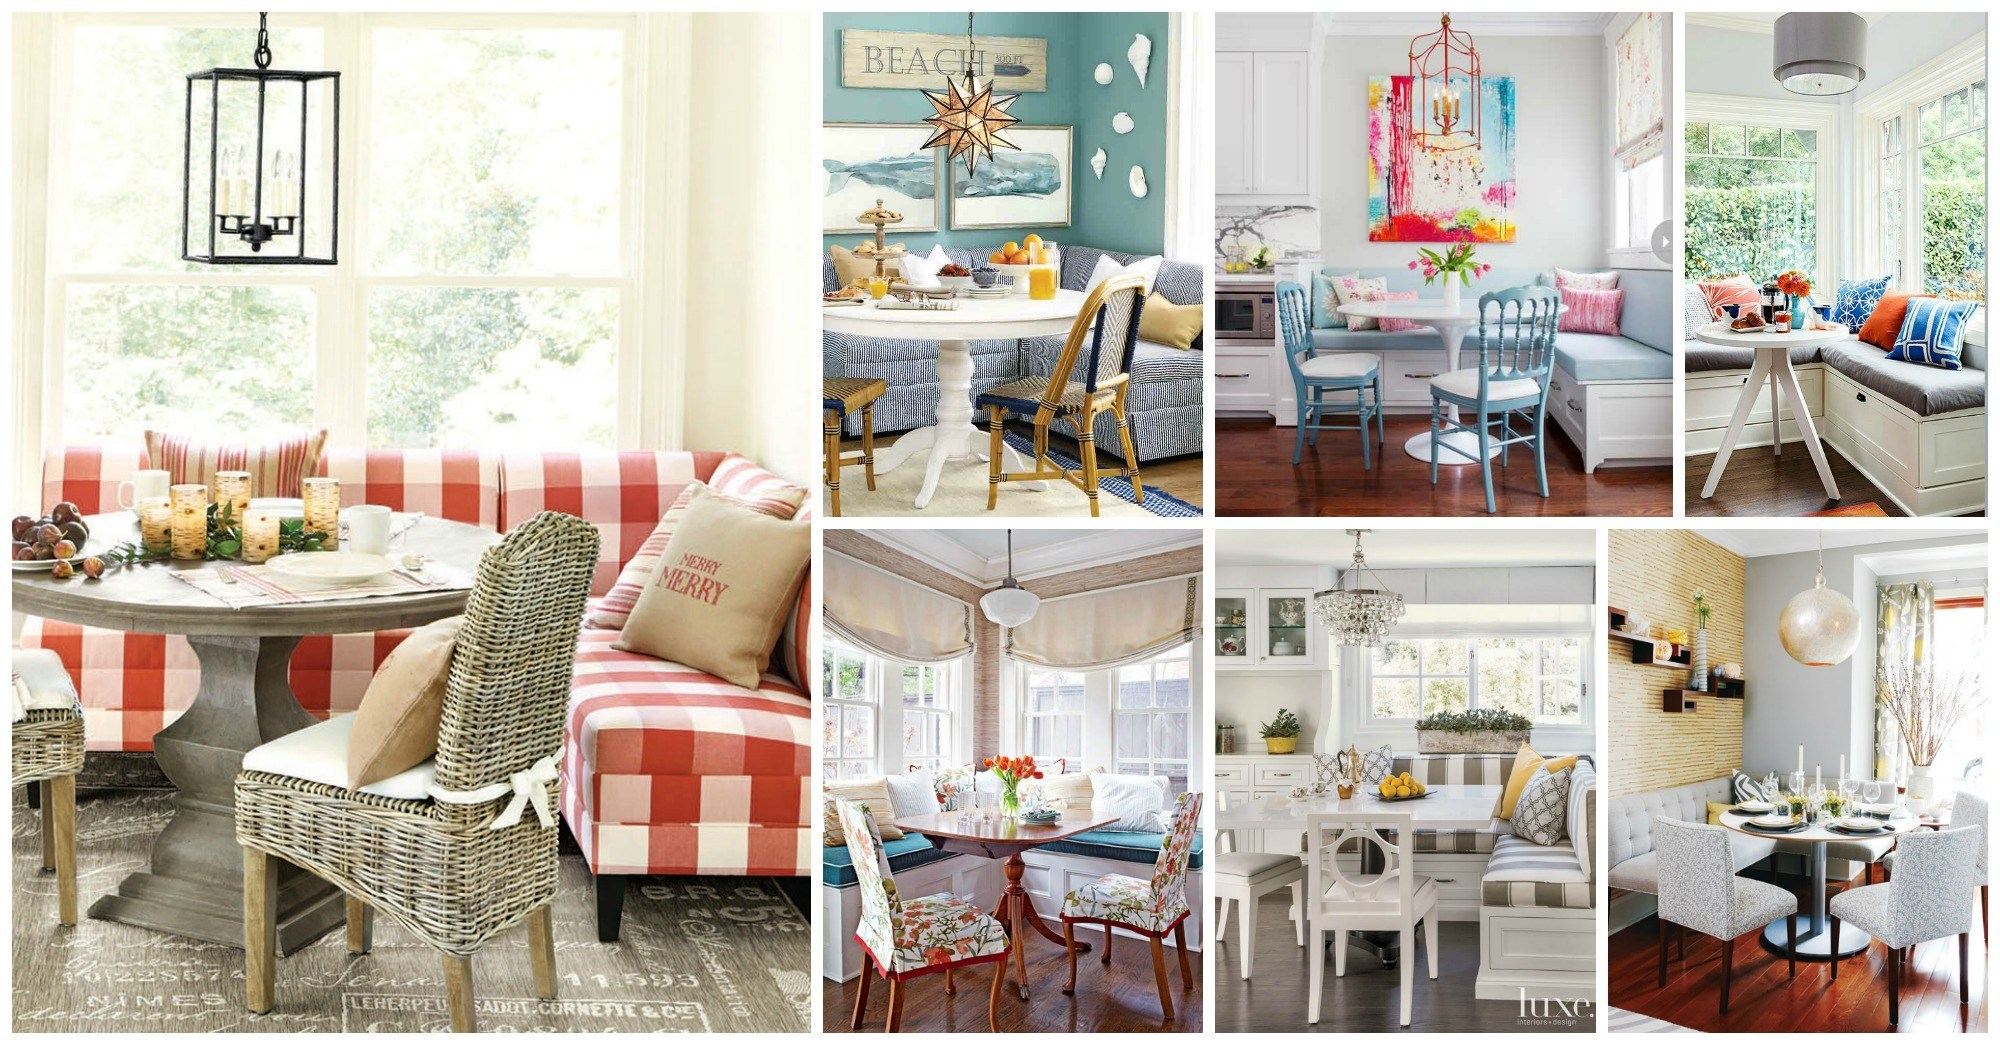 15 Amazing Corner Breakfast Nooks for Tiny Apartments